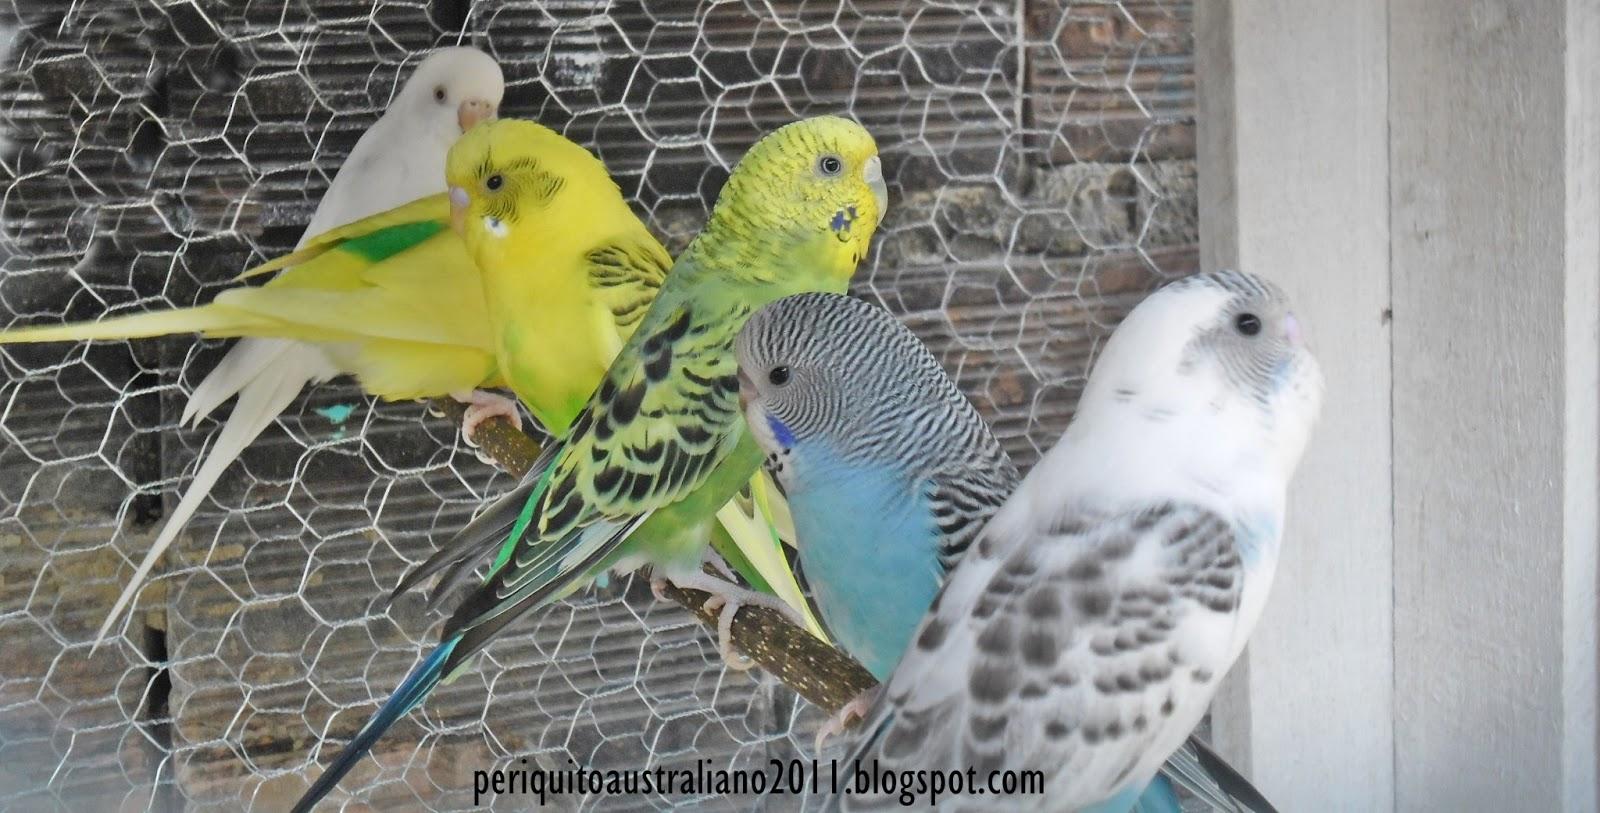 Periquito Australiano - Tudo sobre periquitos está aqui.: Periquito ...